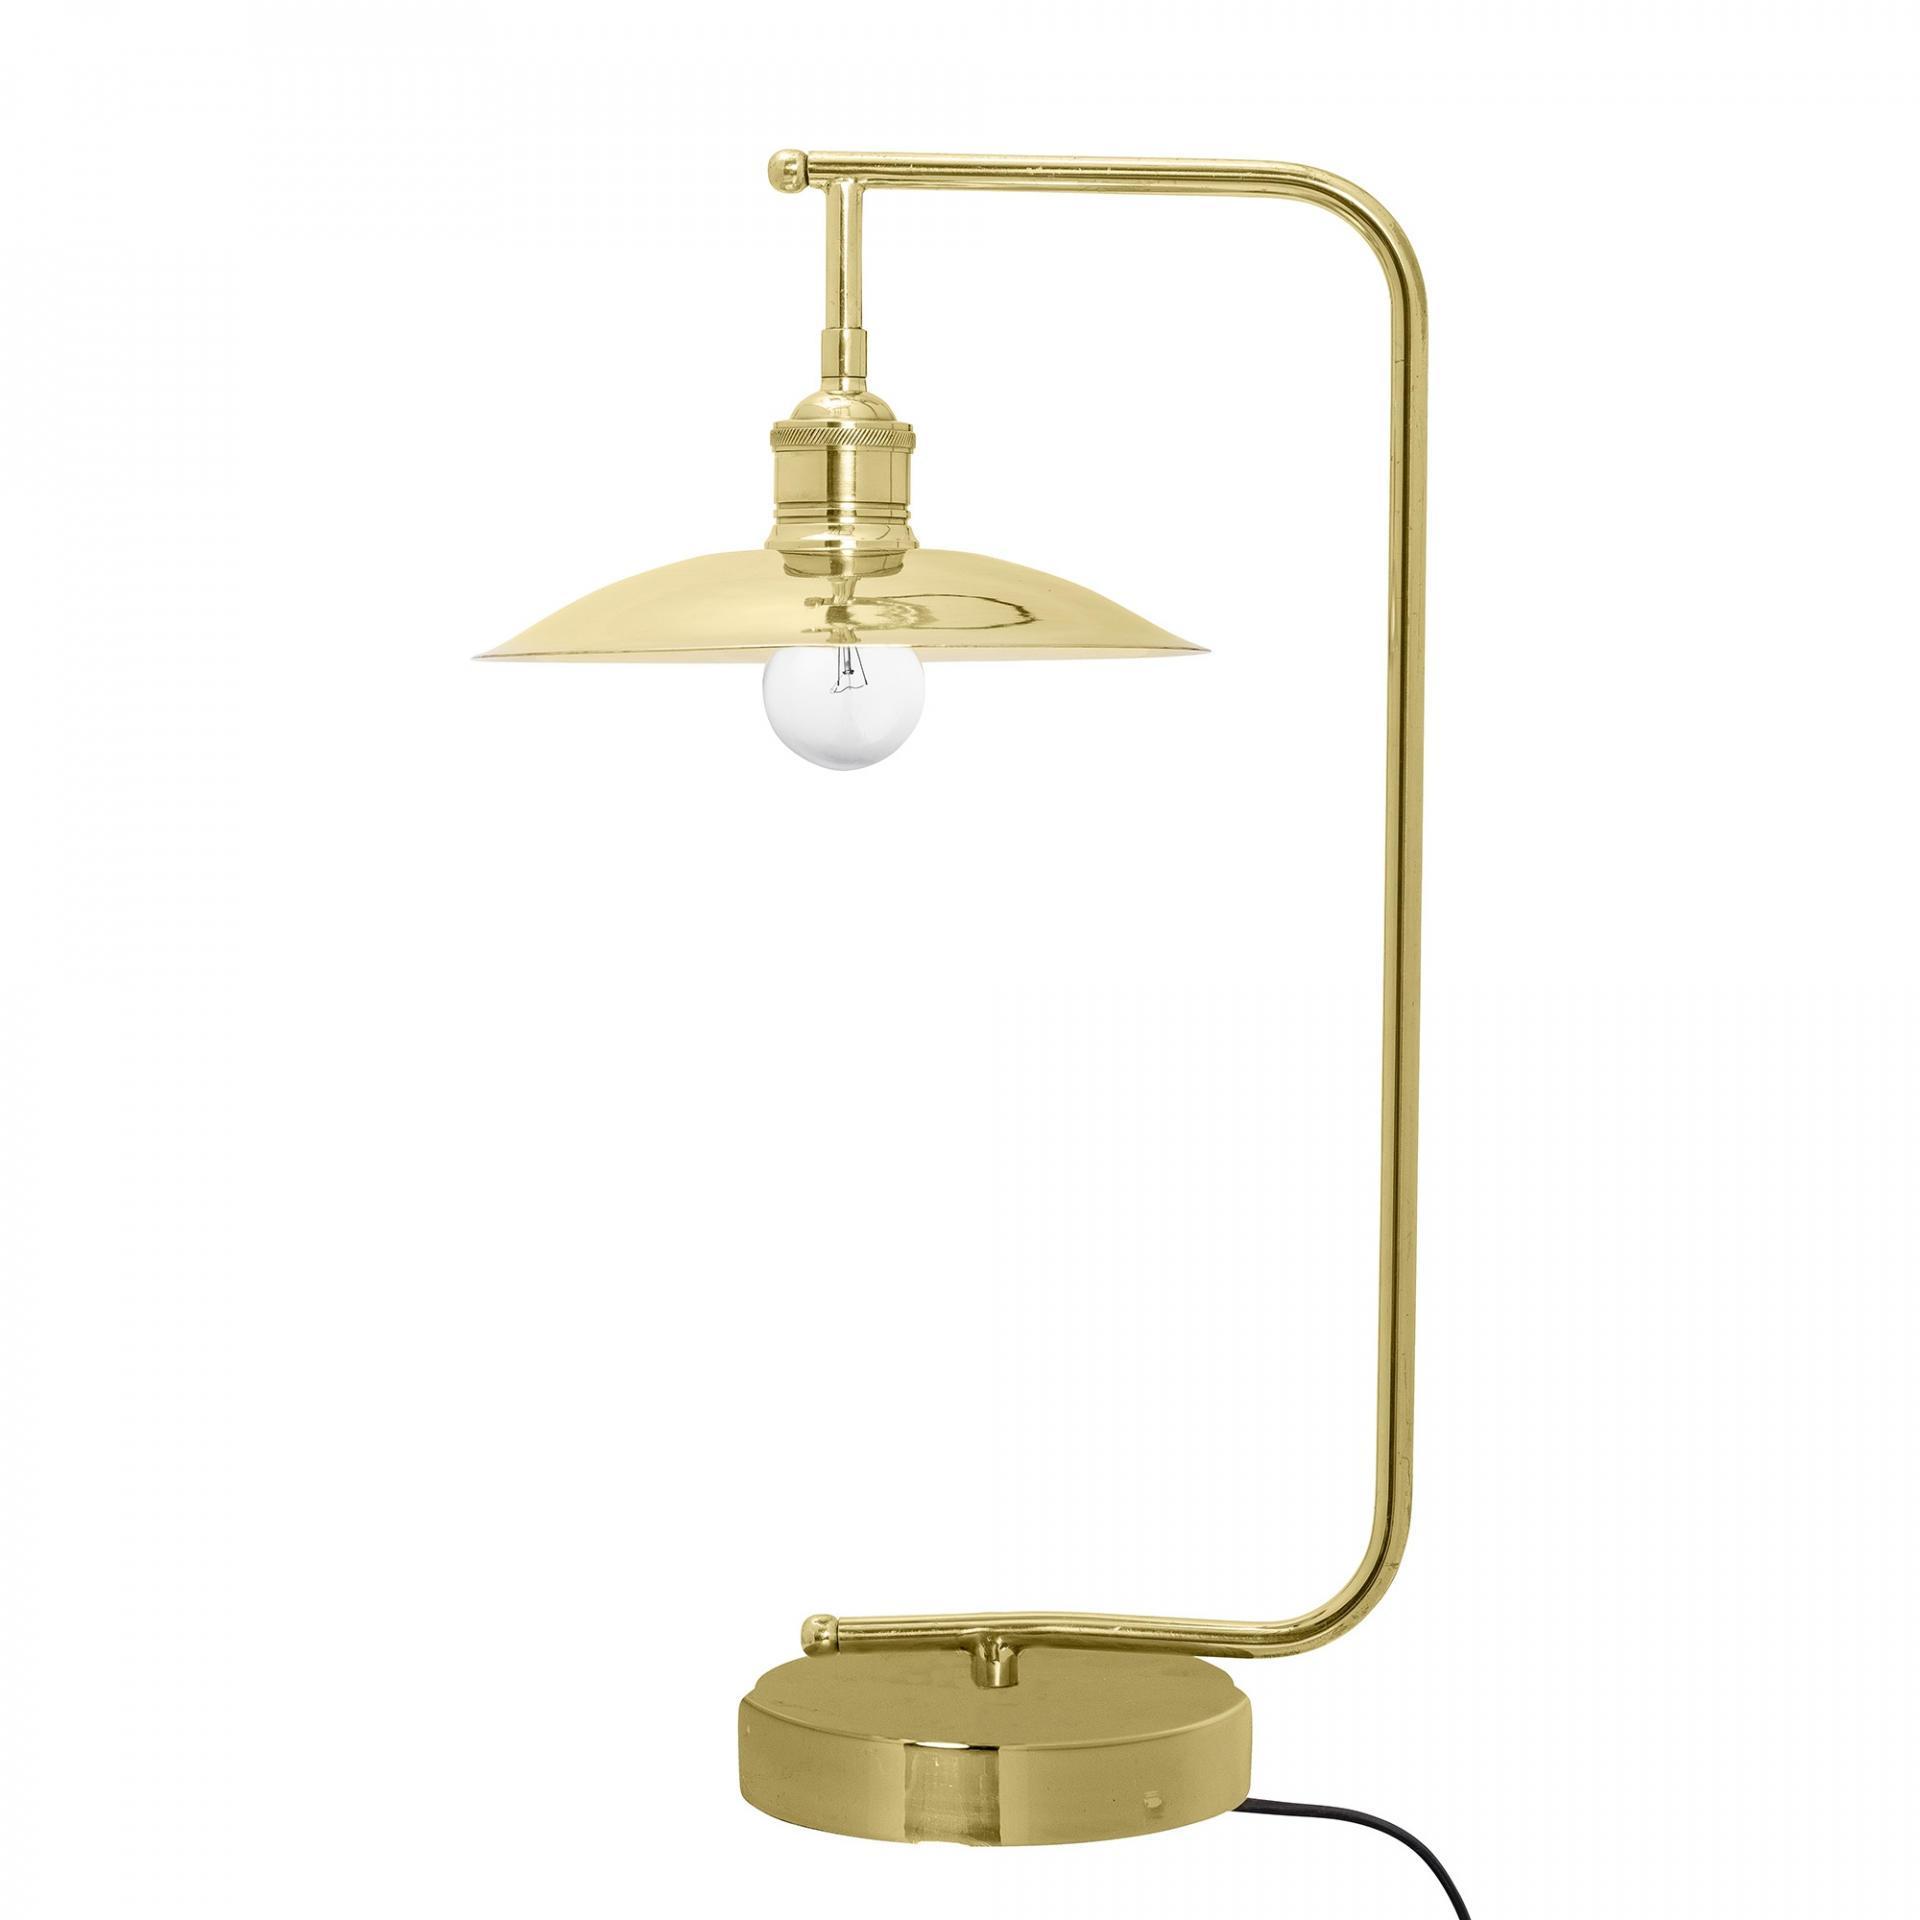 Bloomingville Stolní lampa Industrial Brass, zlatá barva, kov